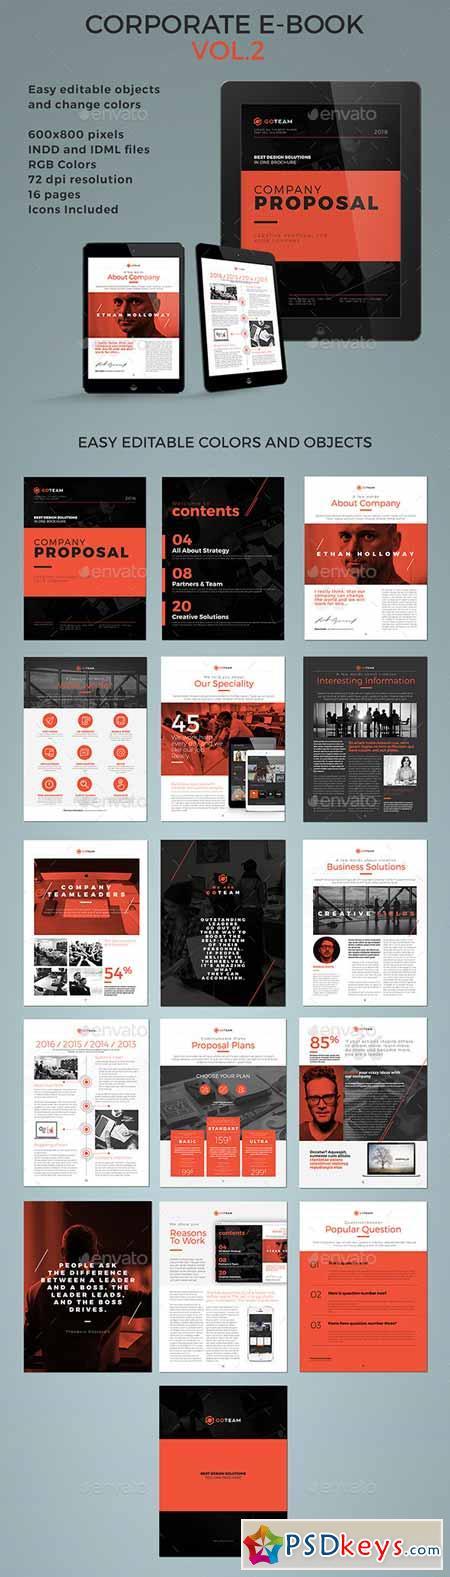 Corporate E-book Template Vol.2 12440752